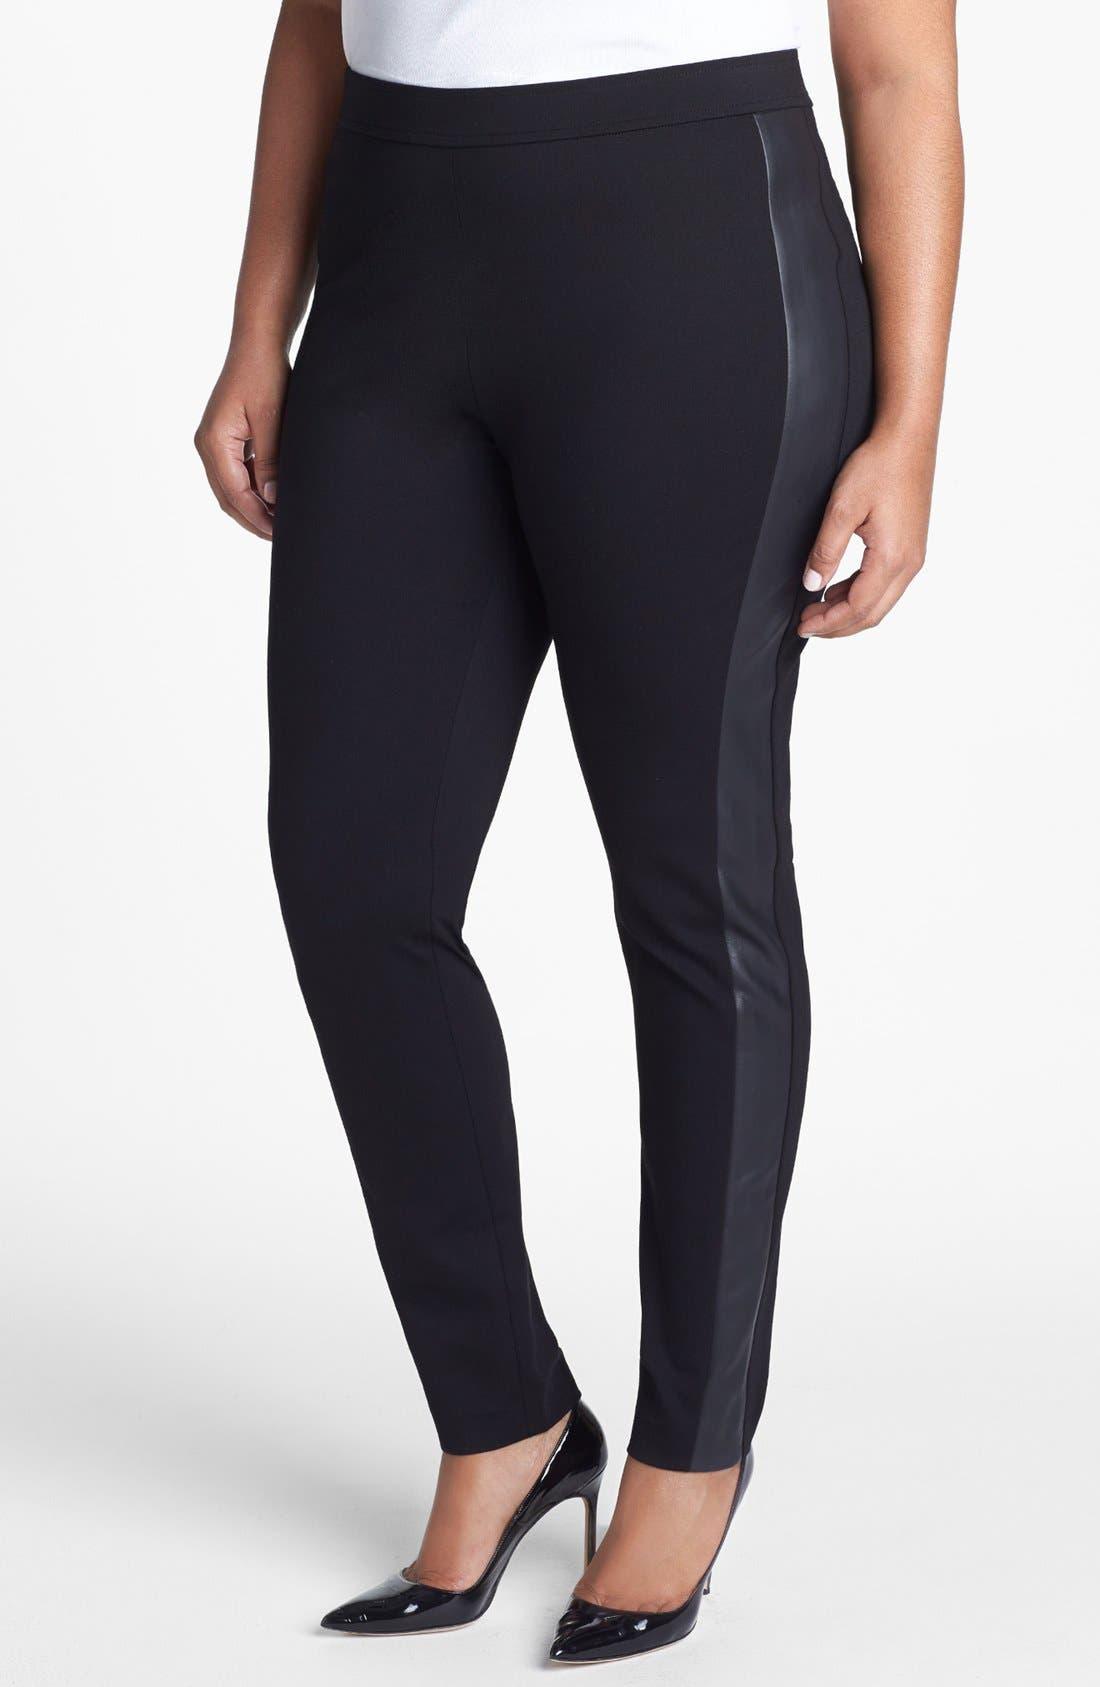 Alternate Image 1 Selected - Sejour Faux Leather & Ponte Knit Pants (Plus Size)